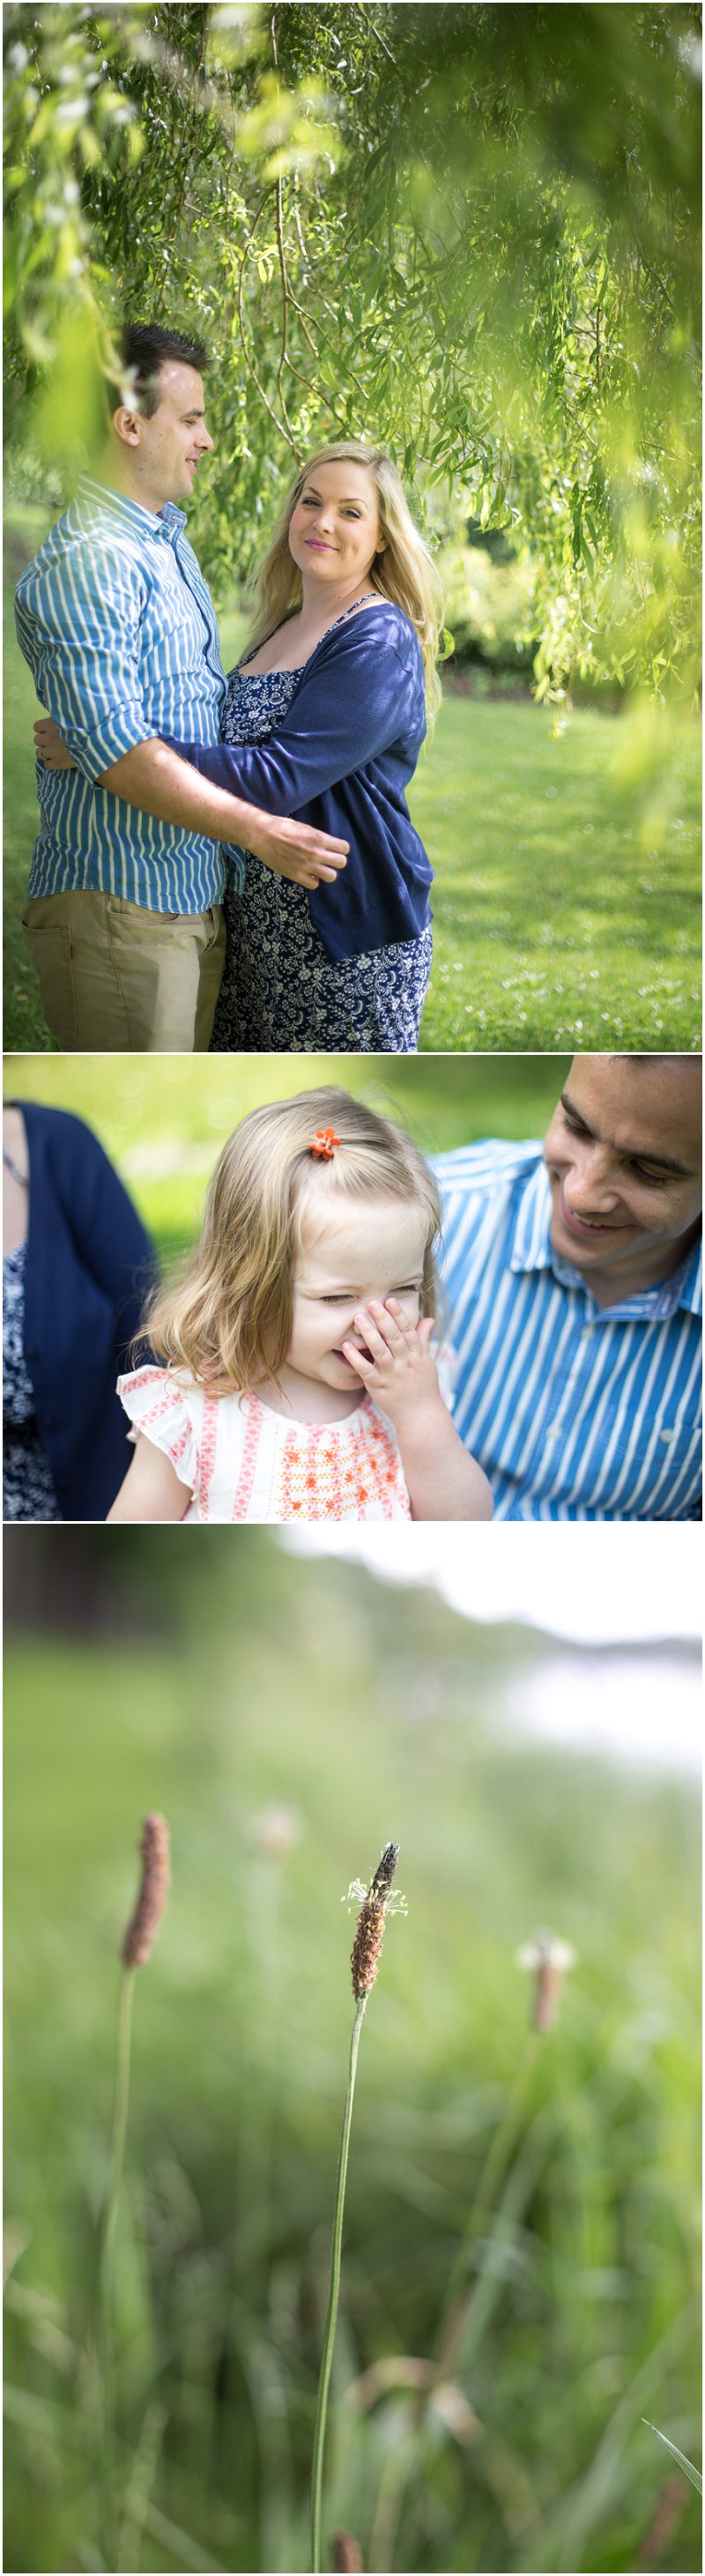 Preston Family Photographer | Karli Harrison Photography